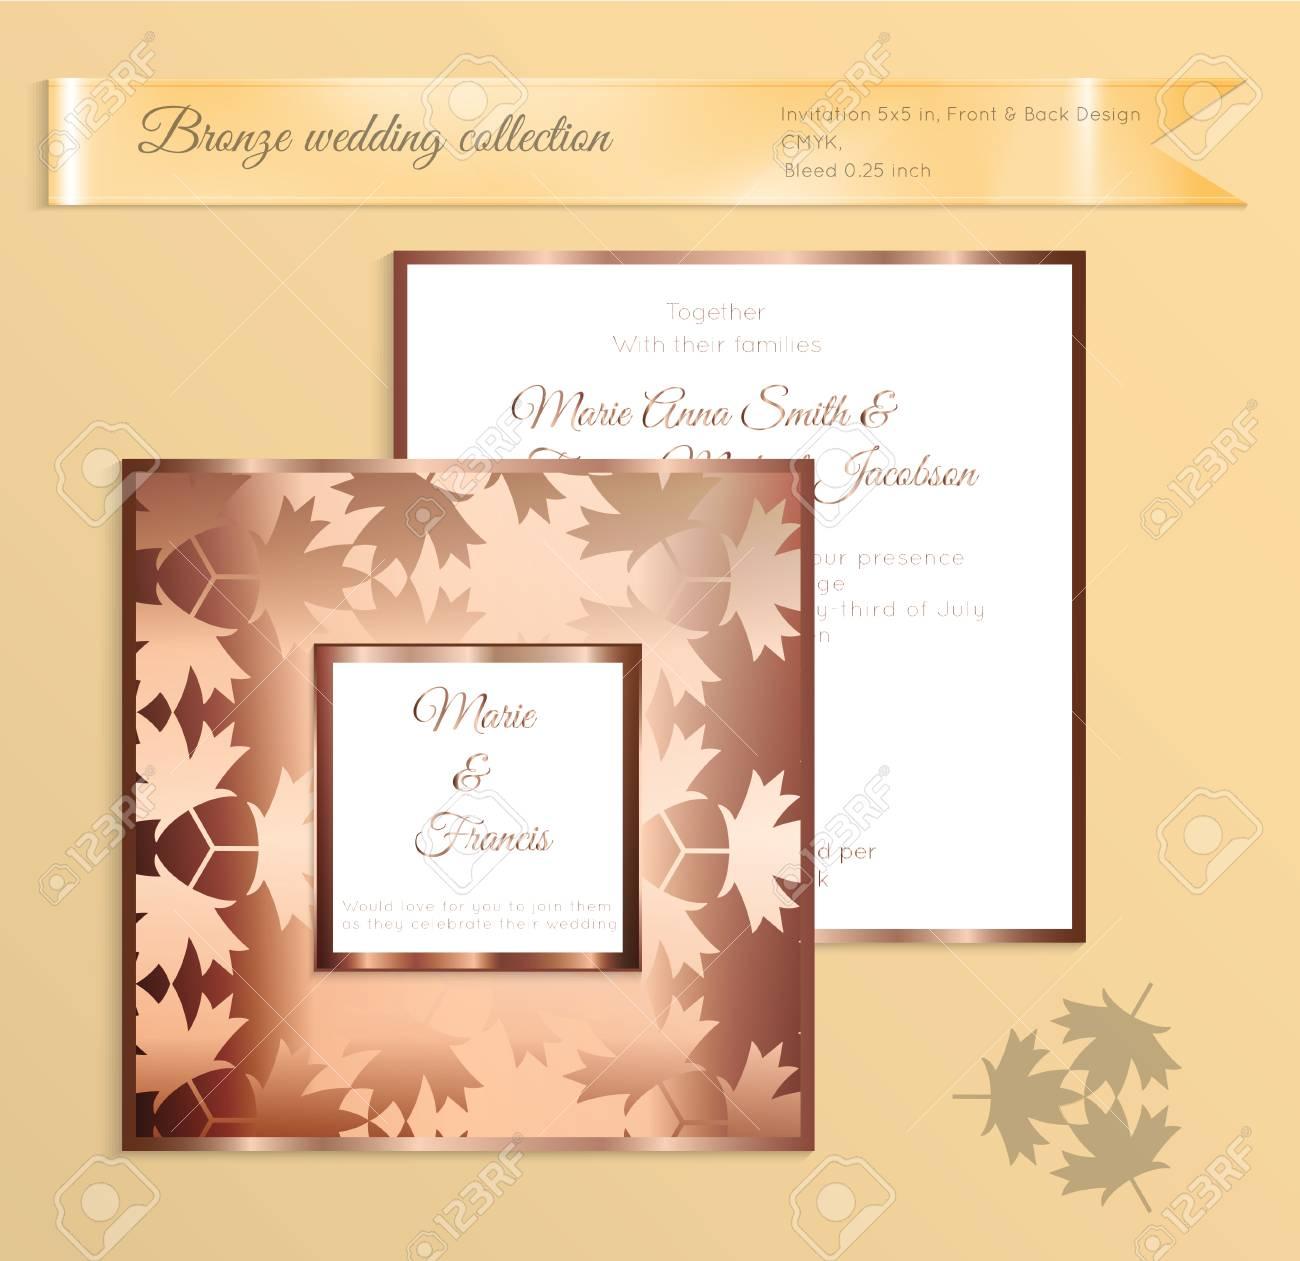 Luxury bronze shiny wedding invitation template back and front luxury bronze shiny wedding invitation template back and front square card layout with rich gold stopboris Images